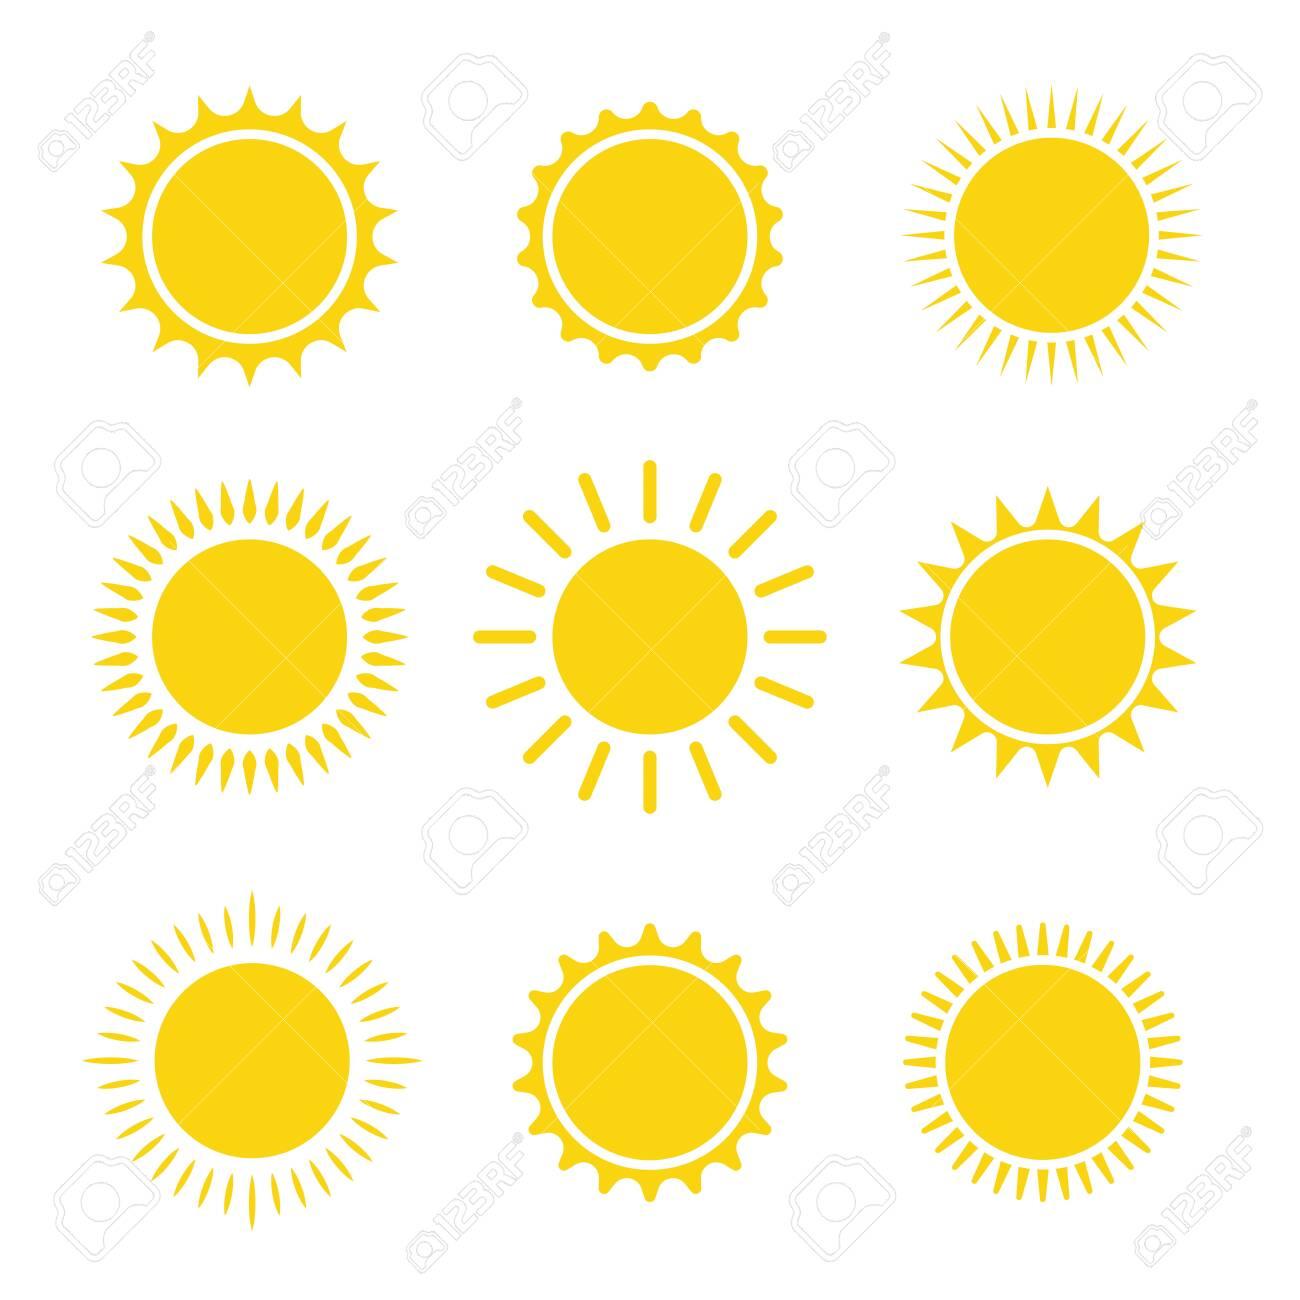 sun icon set summer graphic symbol vector illustration - 145147351